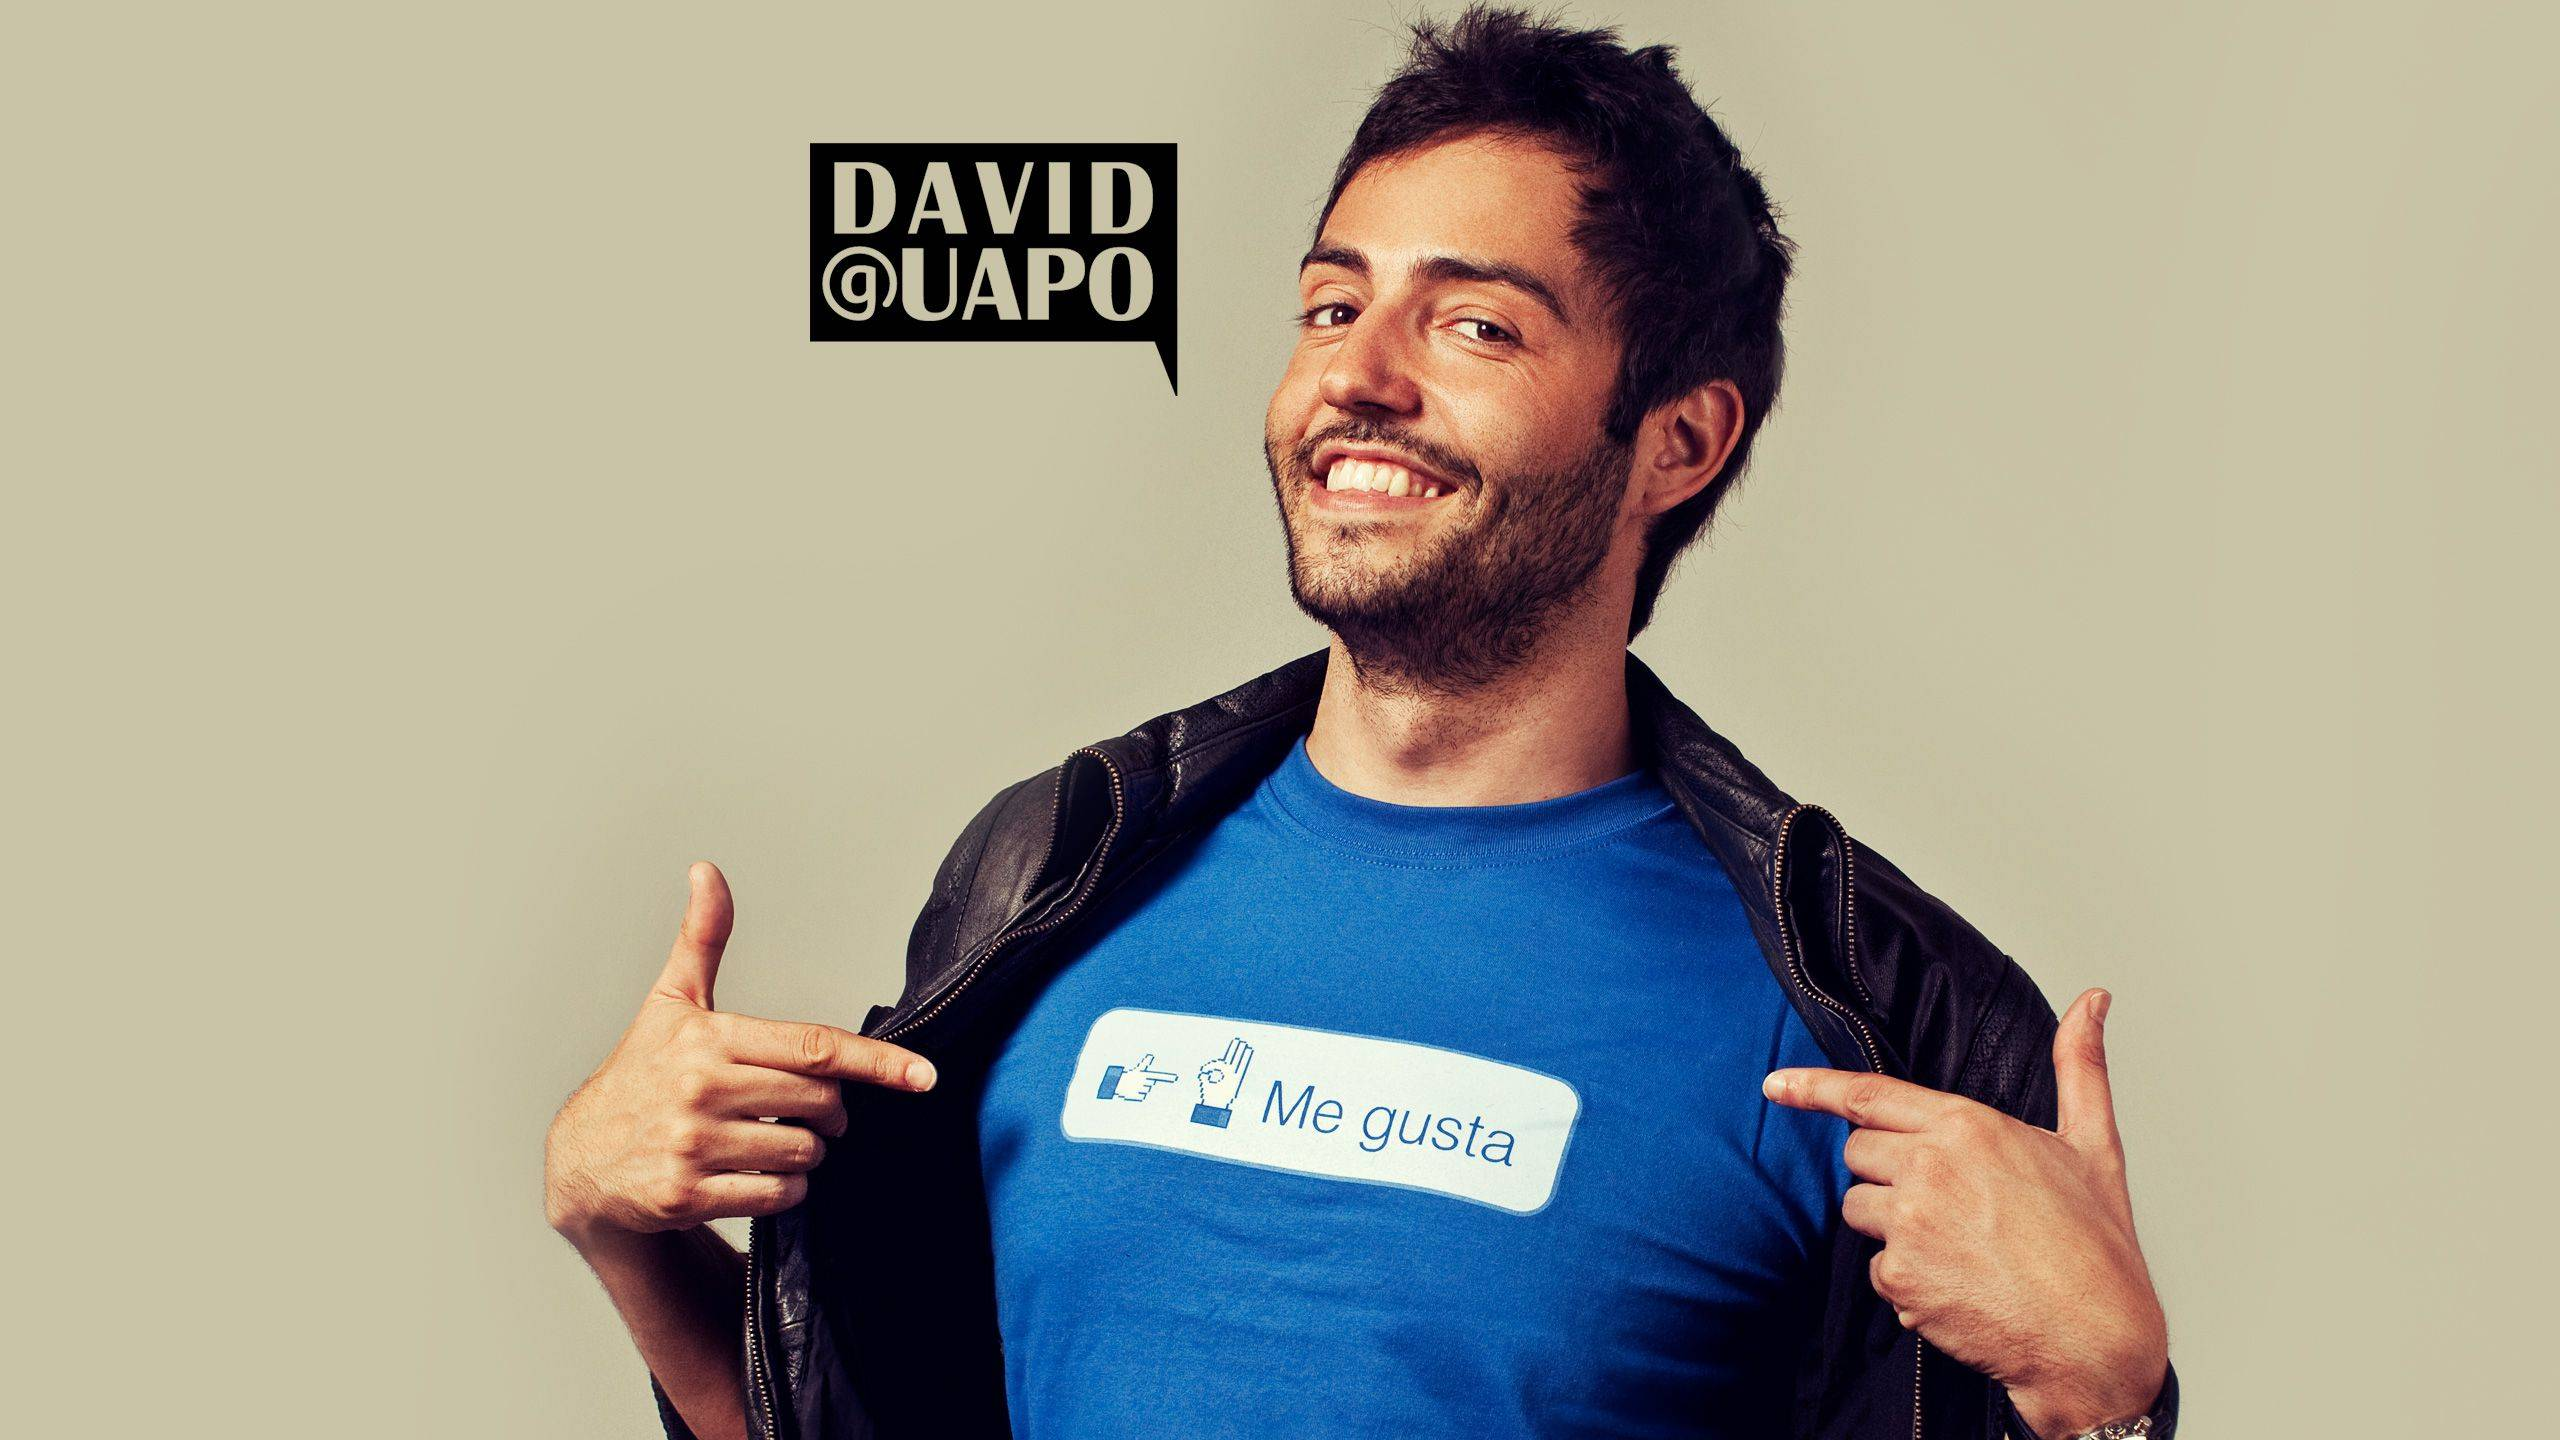 david-guapo